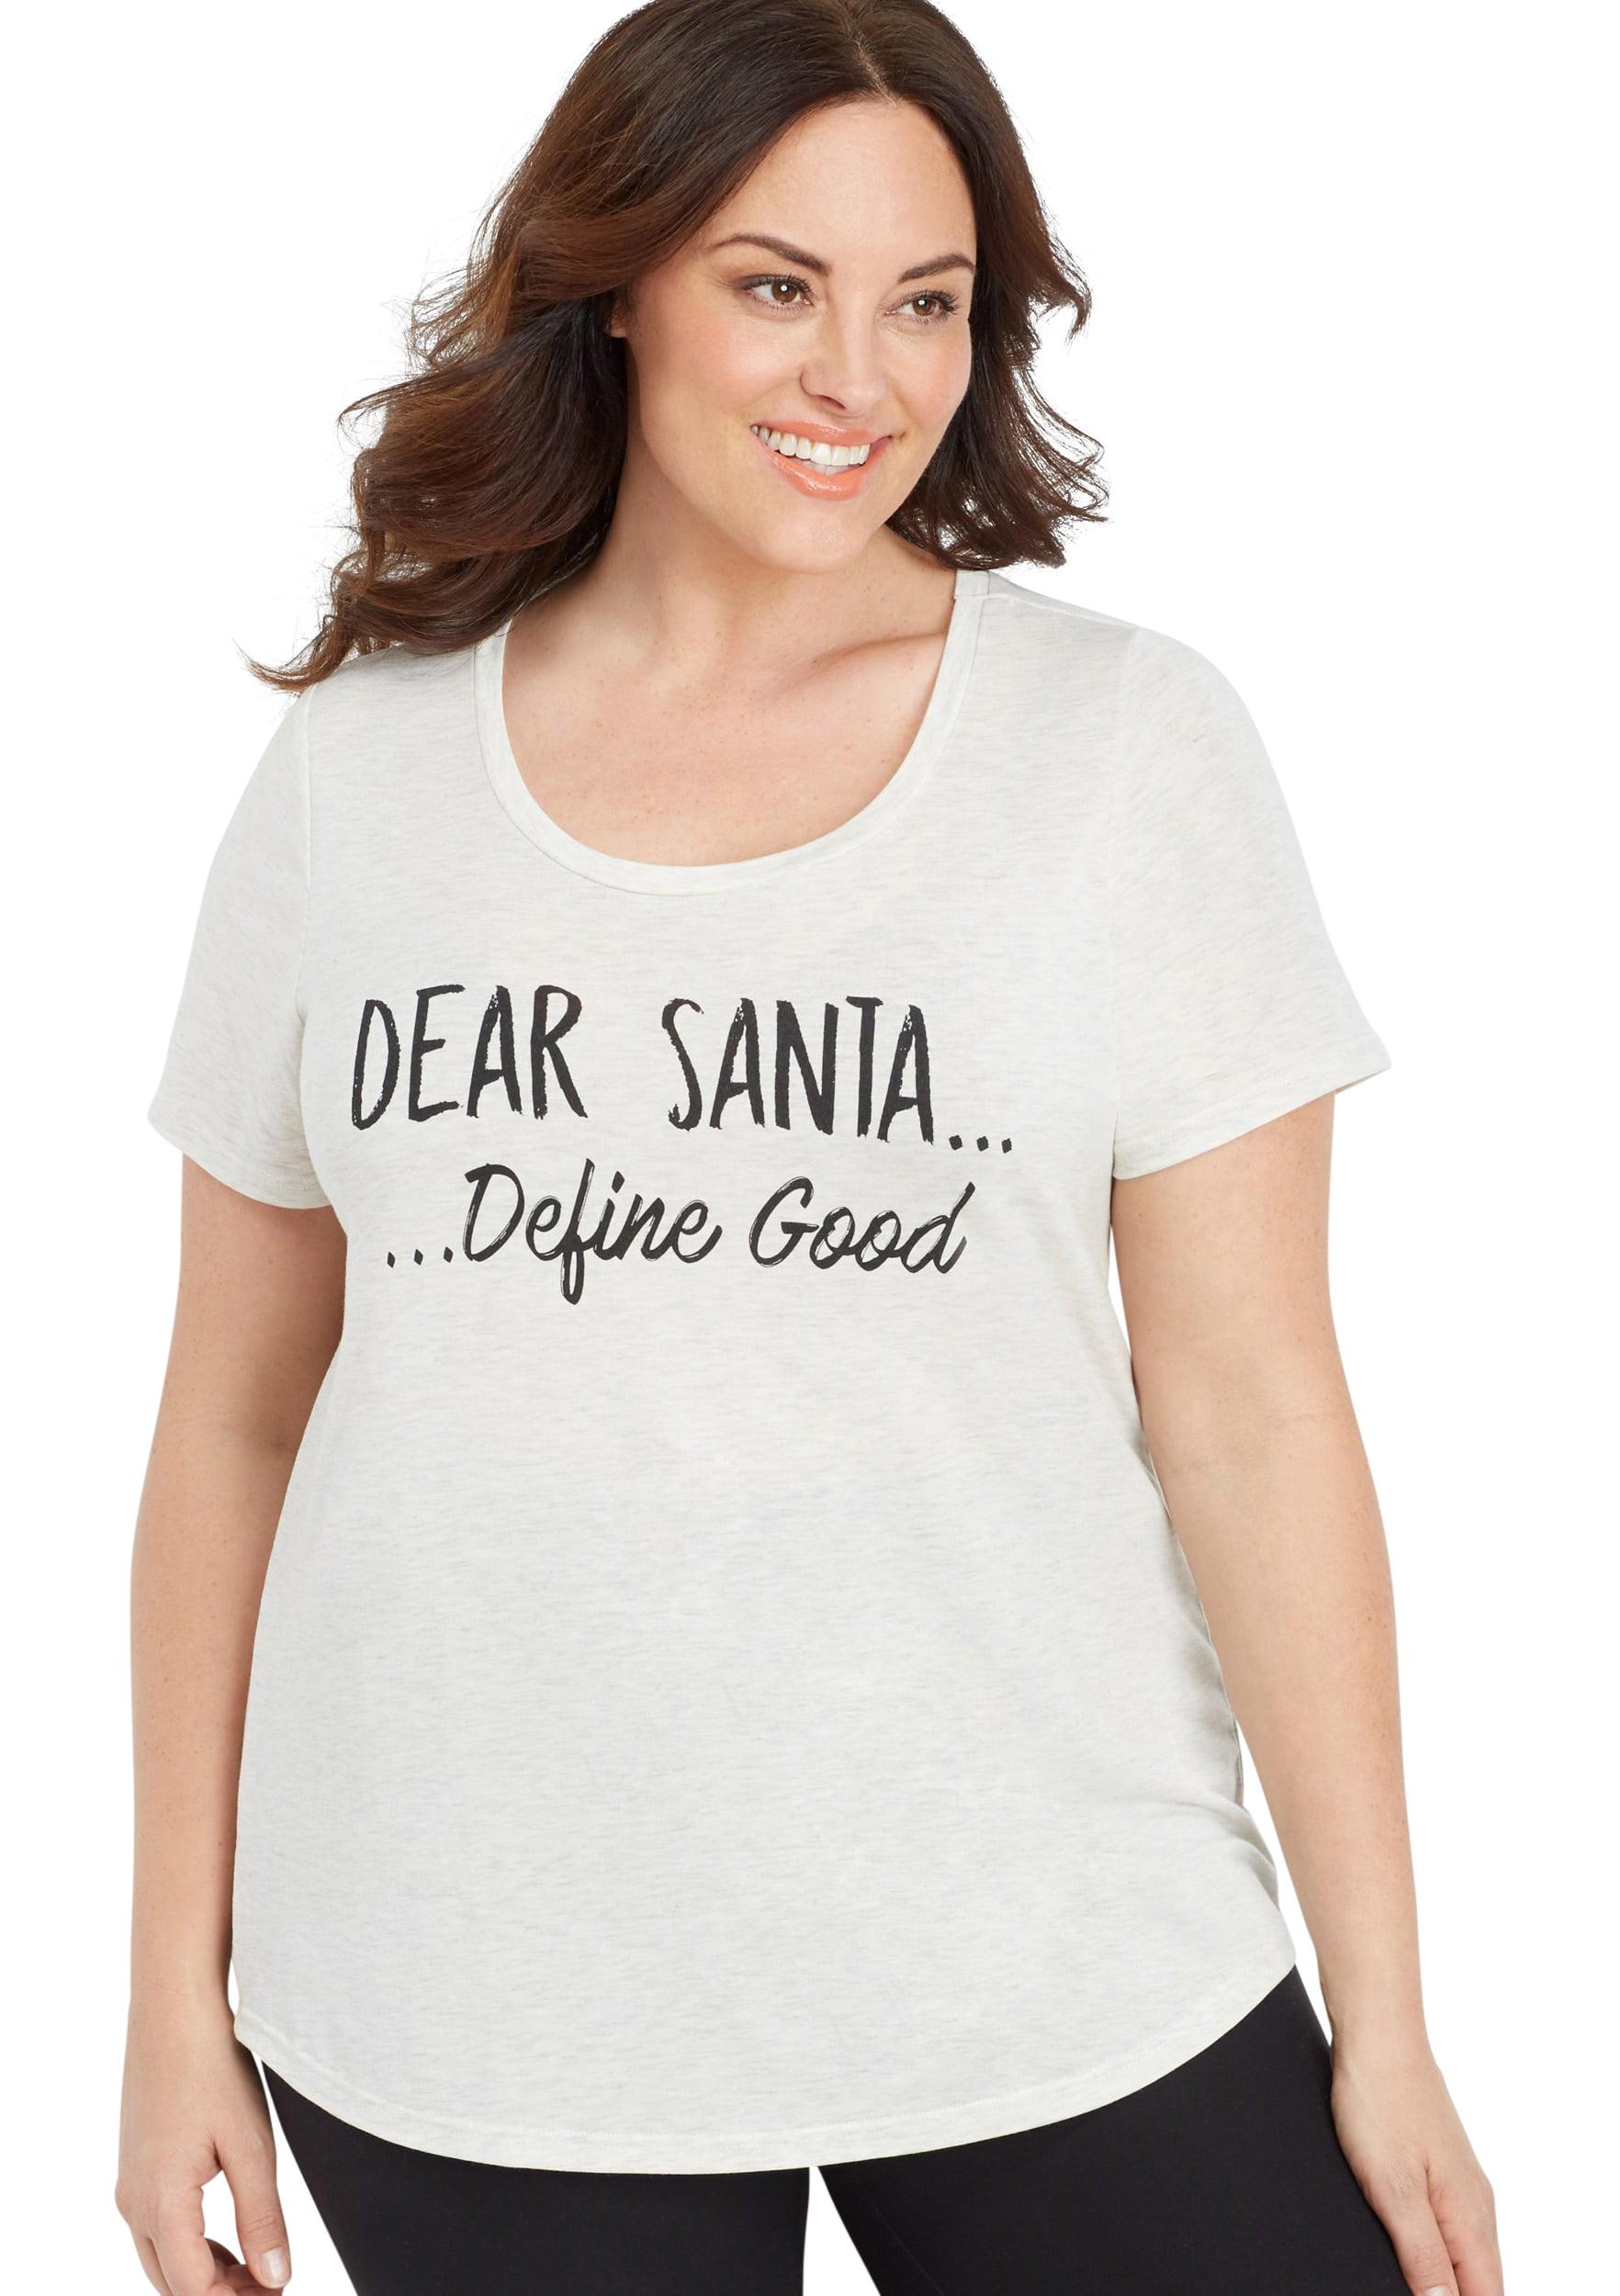 Plus Size Dear Santa Graphic Tee